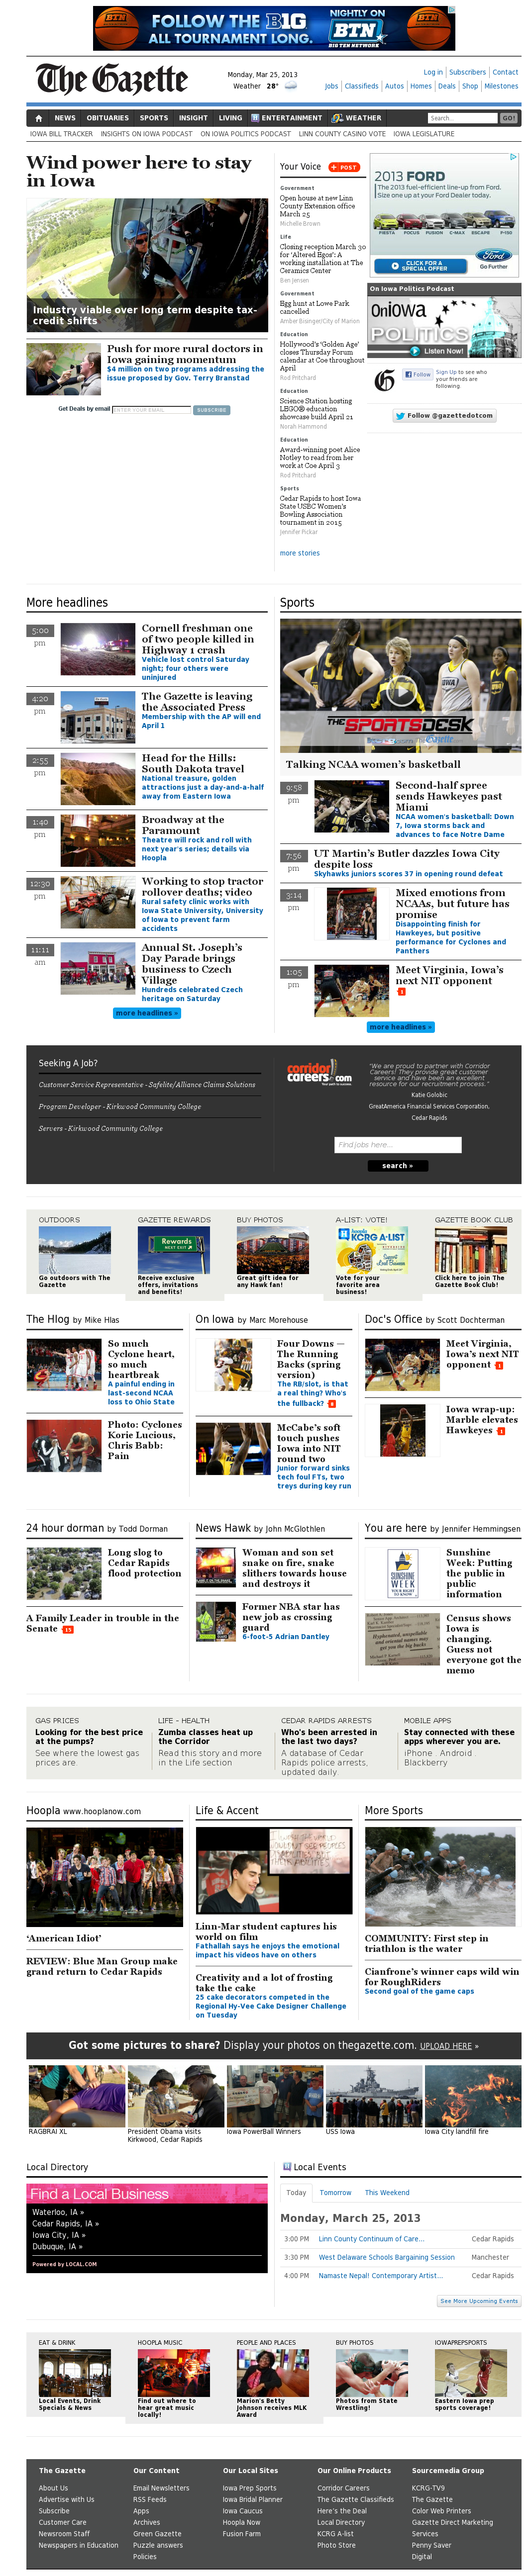 The (Cedar Rapids) Gazette at Monday March 25, 2013, 7:12 a.m. UTC